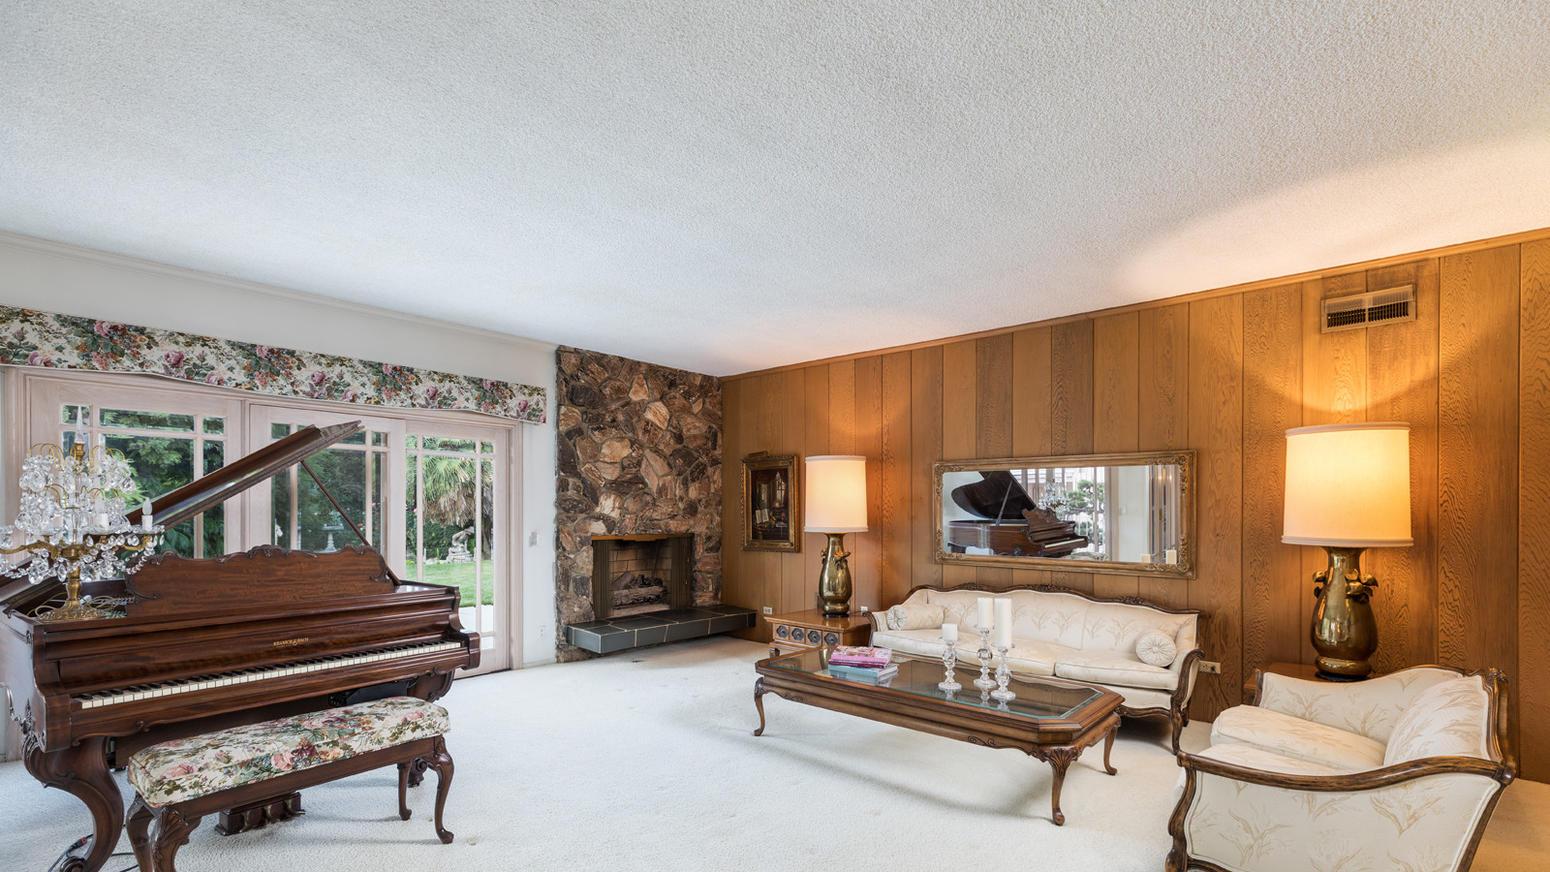 Elegant Link To Slideshow: Slideshow: Peek Inside The U0027Brady Bunchu0027 House